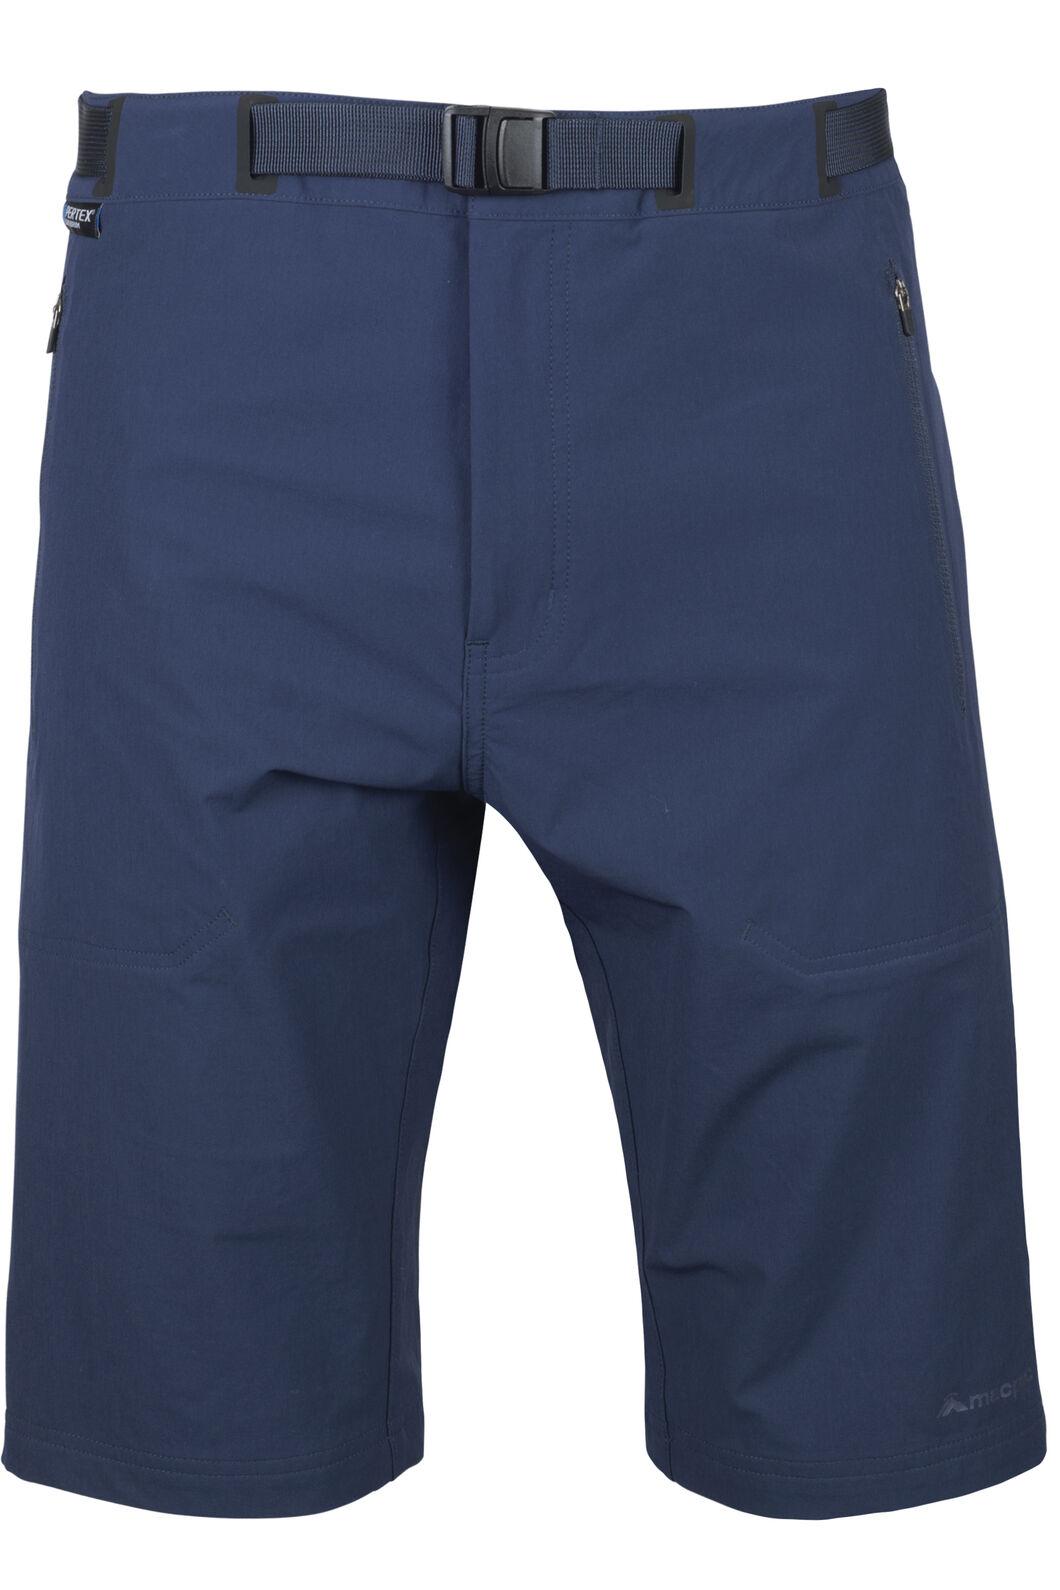 Macpac Trekker Pertex® Equilibrium Softshell Shorts — Men's, Black Iris, hi-res